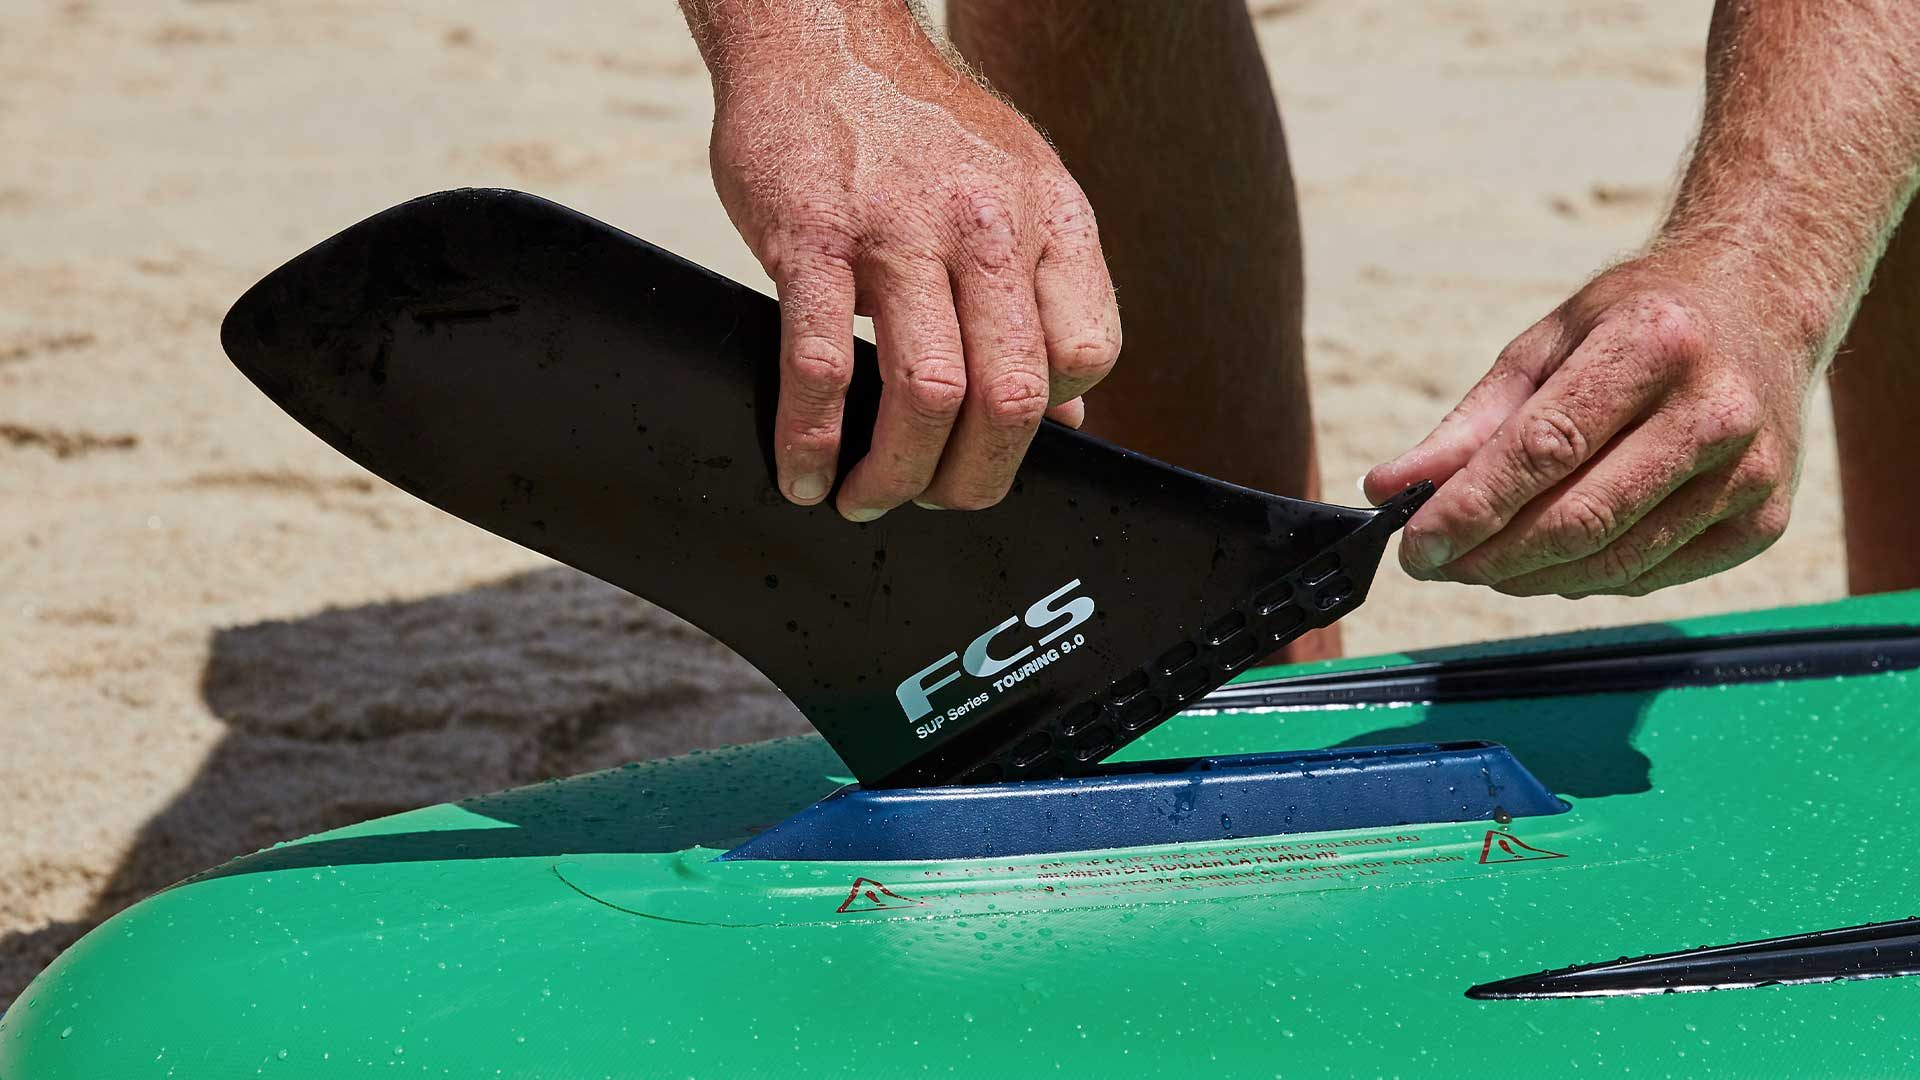 redpaddleco-150-voyager-tandem-inflatable-paddle-board-desktop-gallery-fins